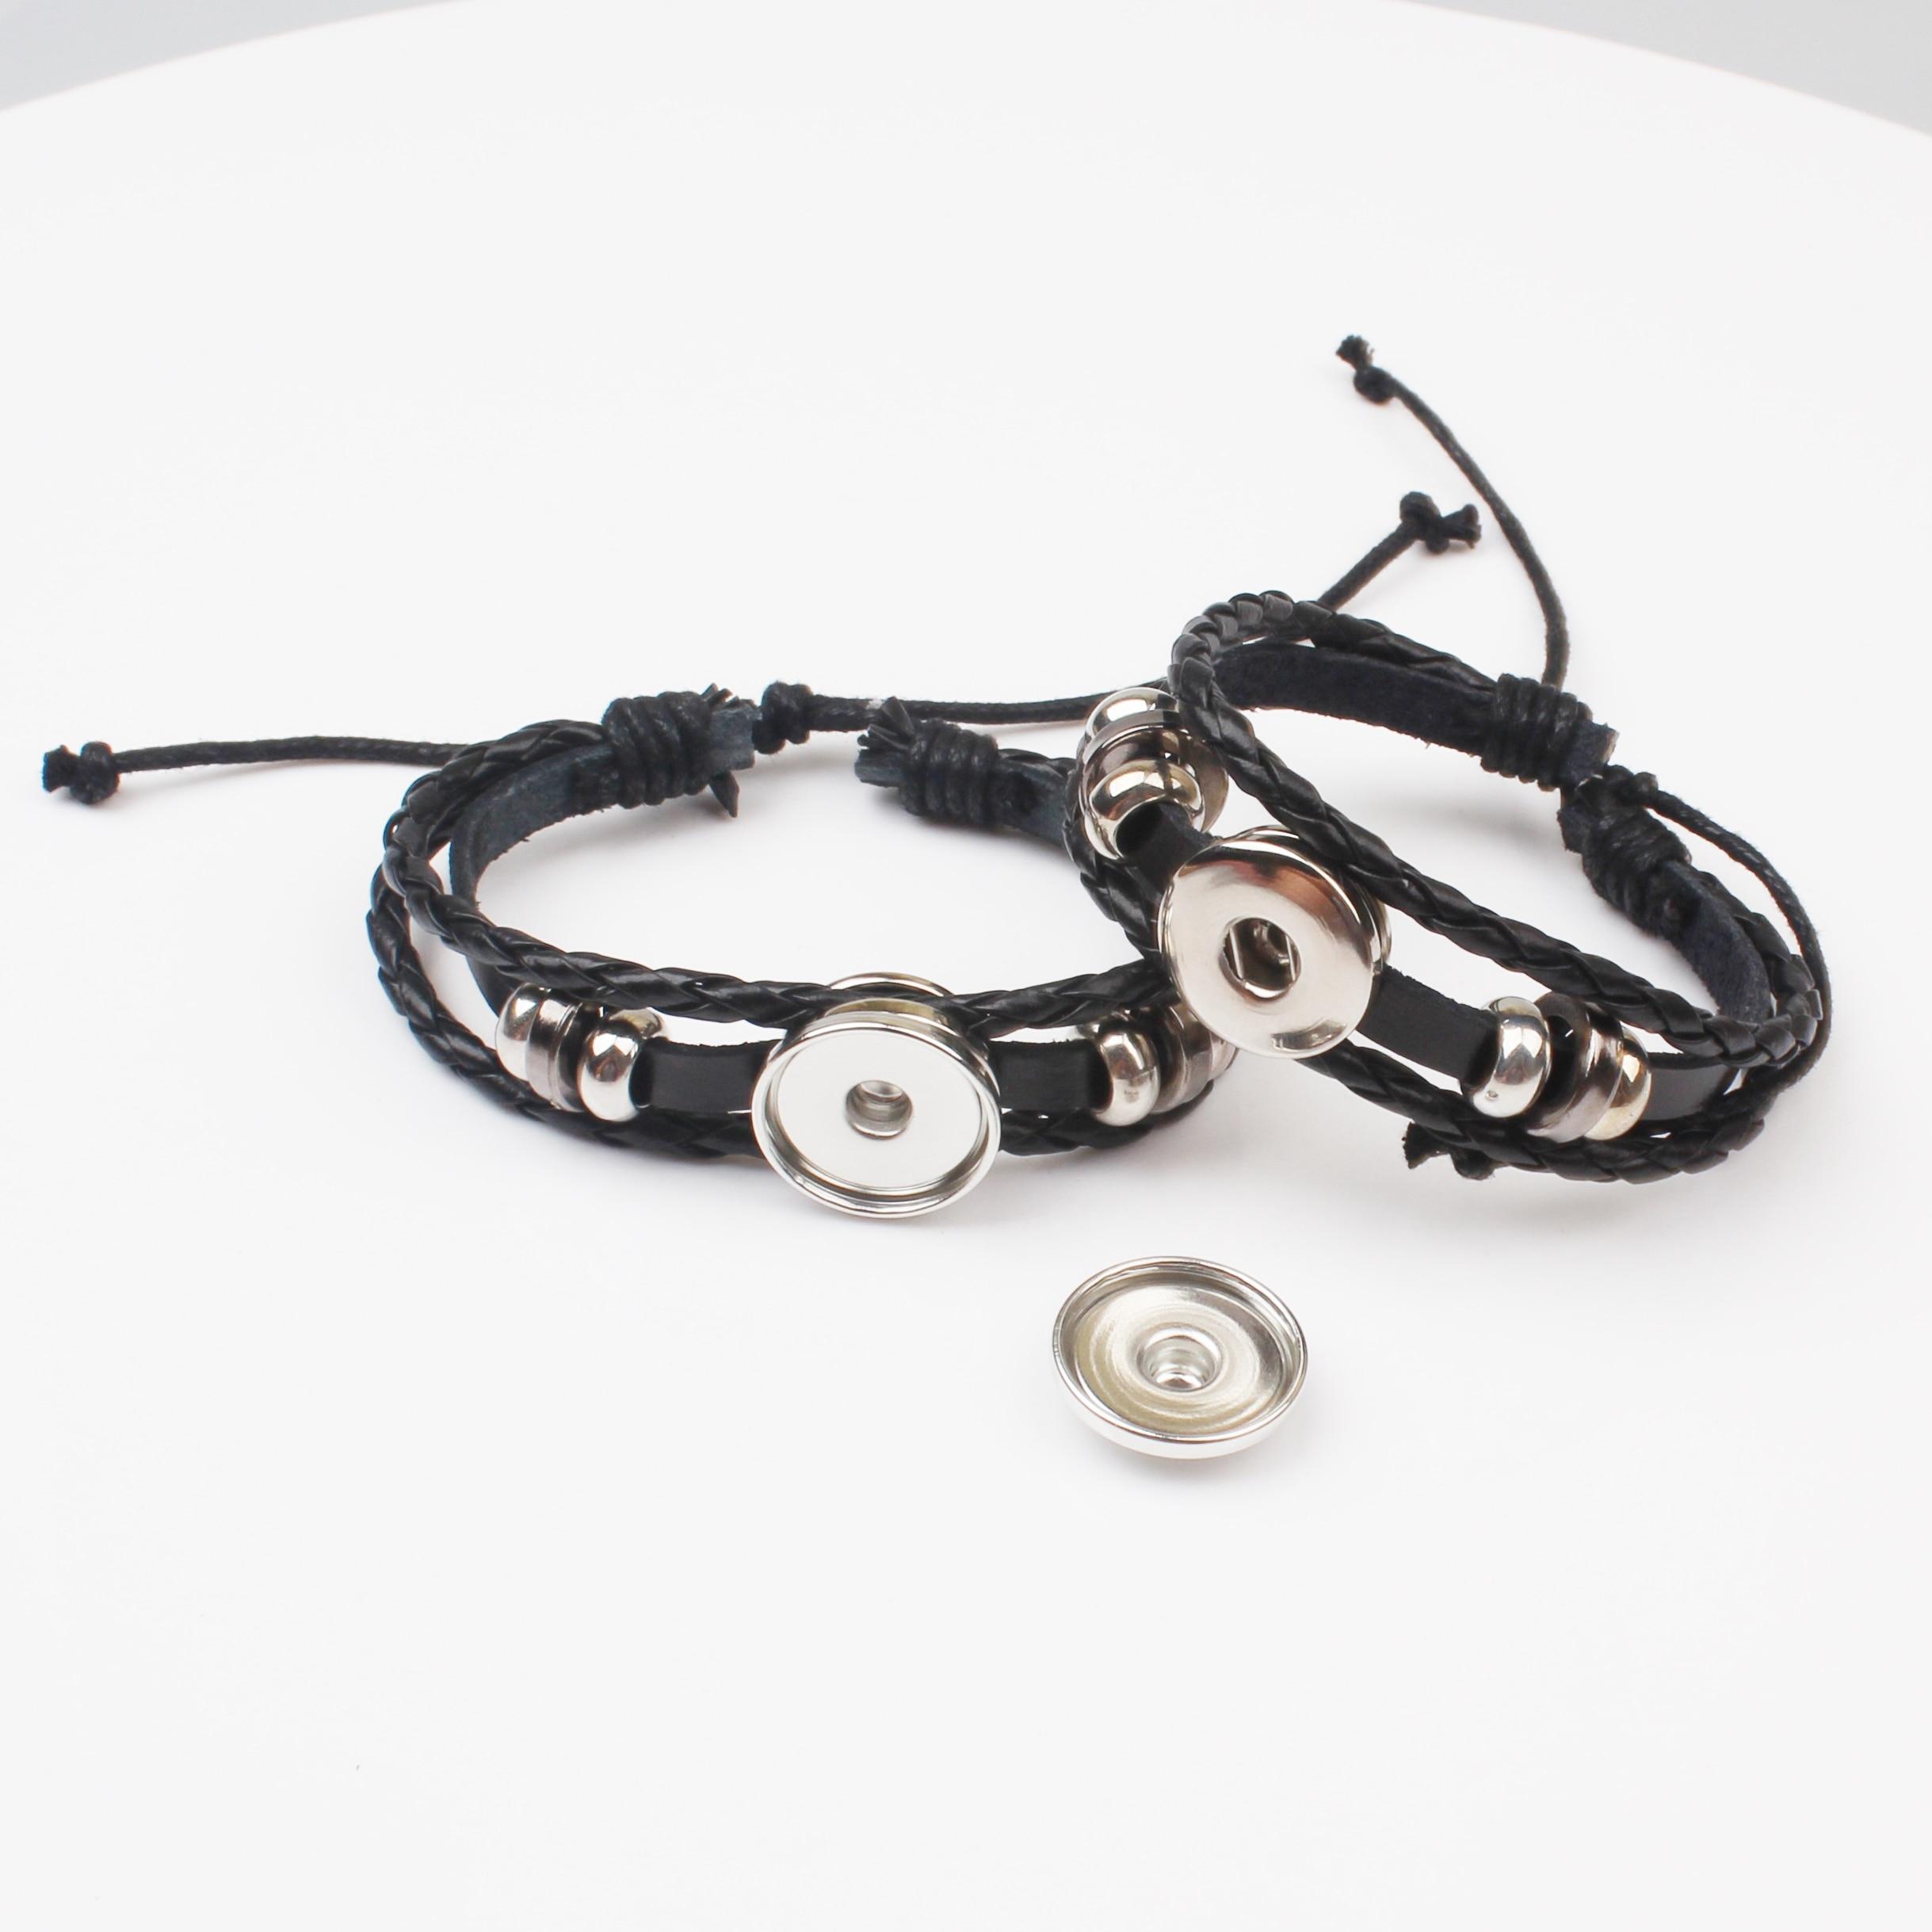 XKXLHJ New Twenty One Pilot Leather Bracelet American Rock Band POM POM Bracelet Steampunk Jewelry Ms Men 39 s Gift in Charm Bracelets from Jewelry amp Accessories